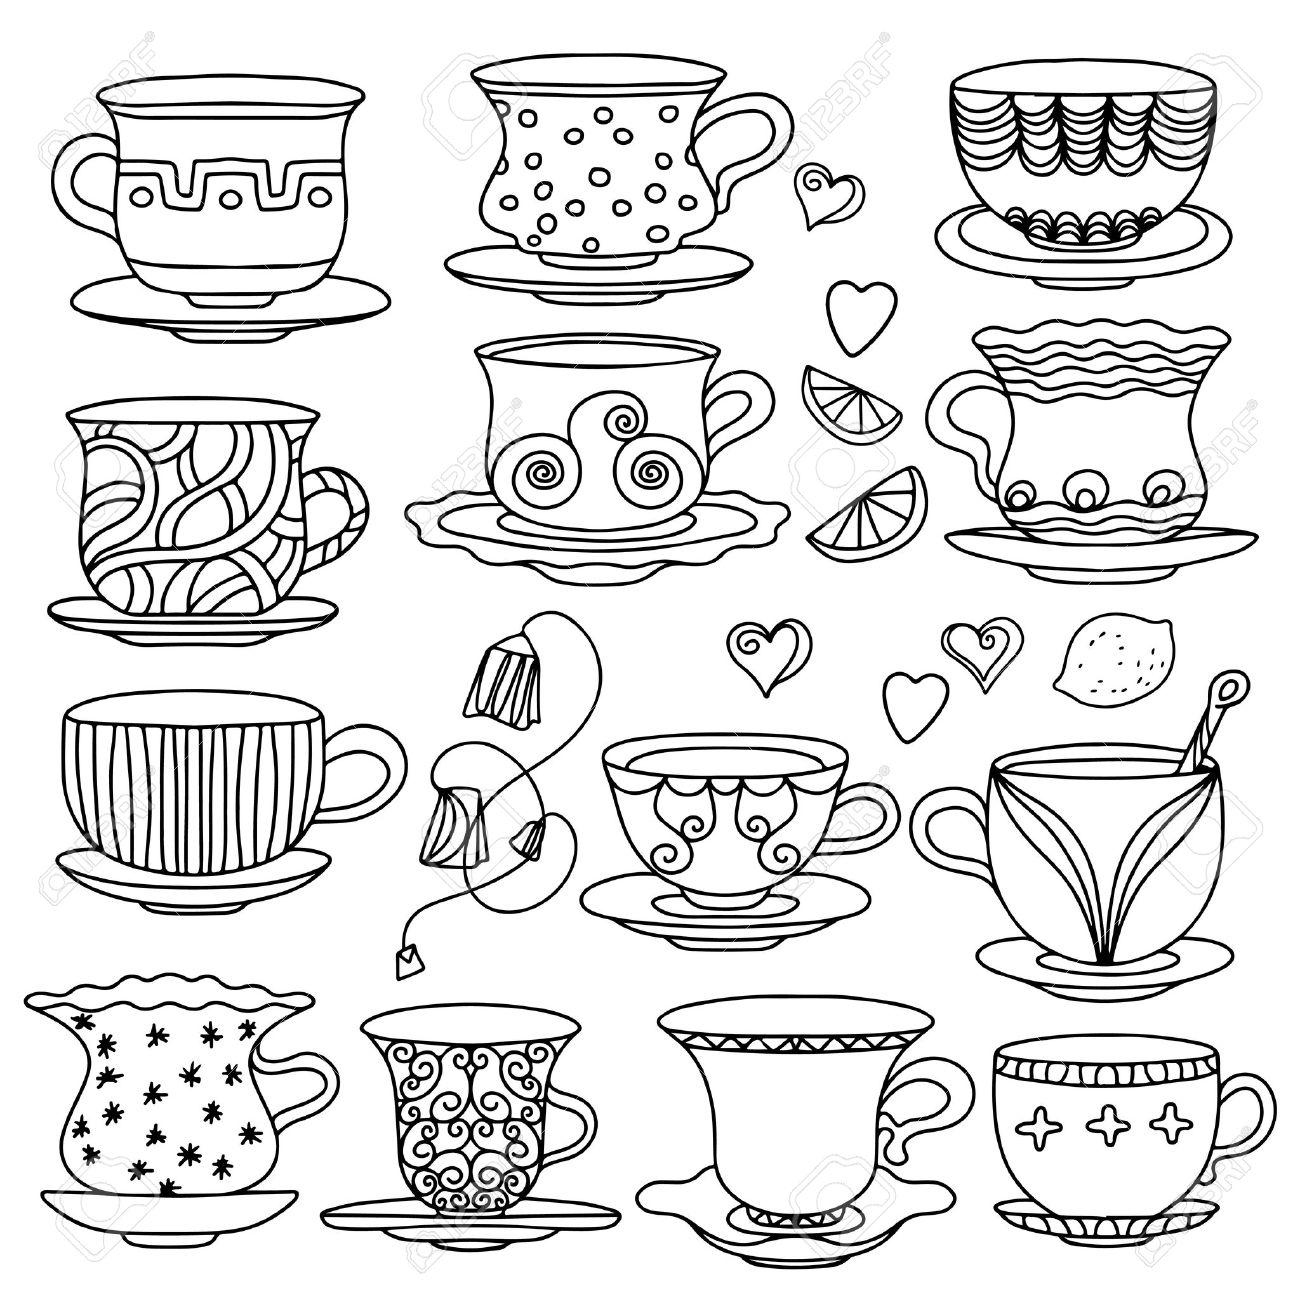 Drawn teacup tea set Pesquisa tea Google  Google